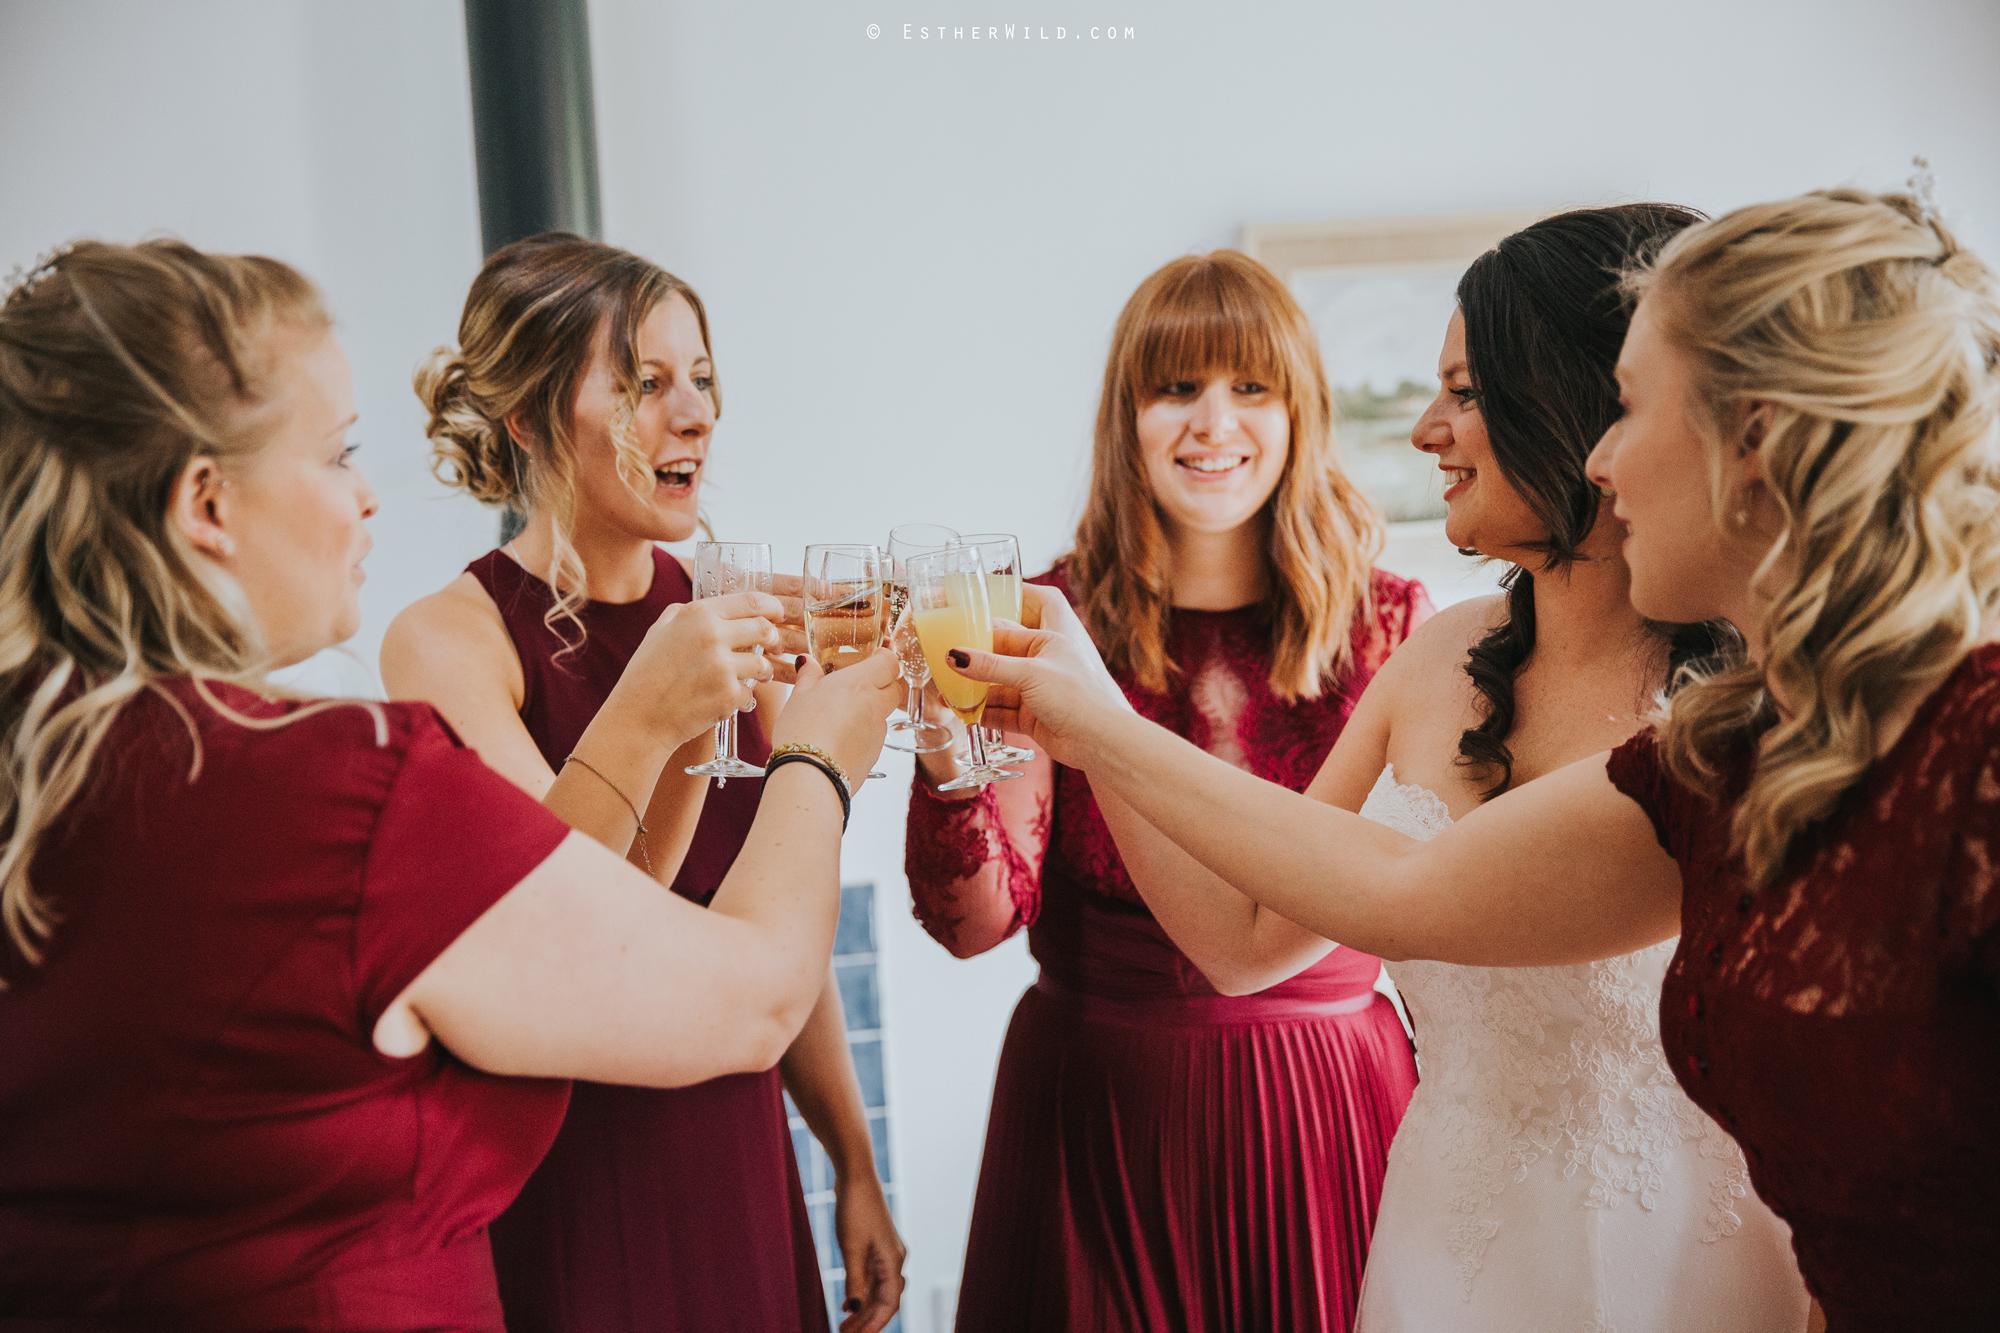 Reading_Room_Weddings_Alby_Norwich_Photographer_Esther_Wild_IMG_0611.jpg